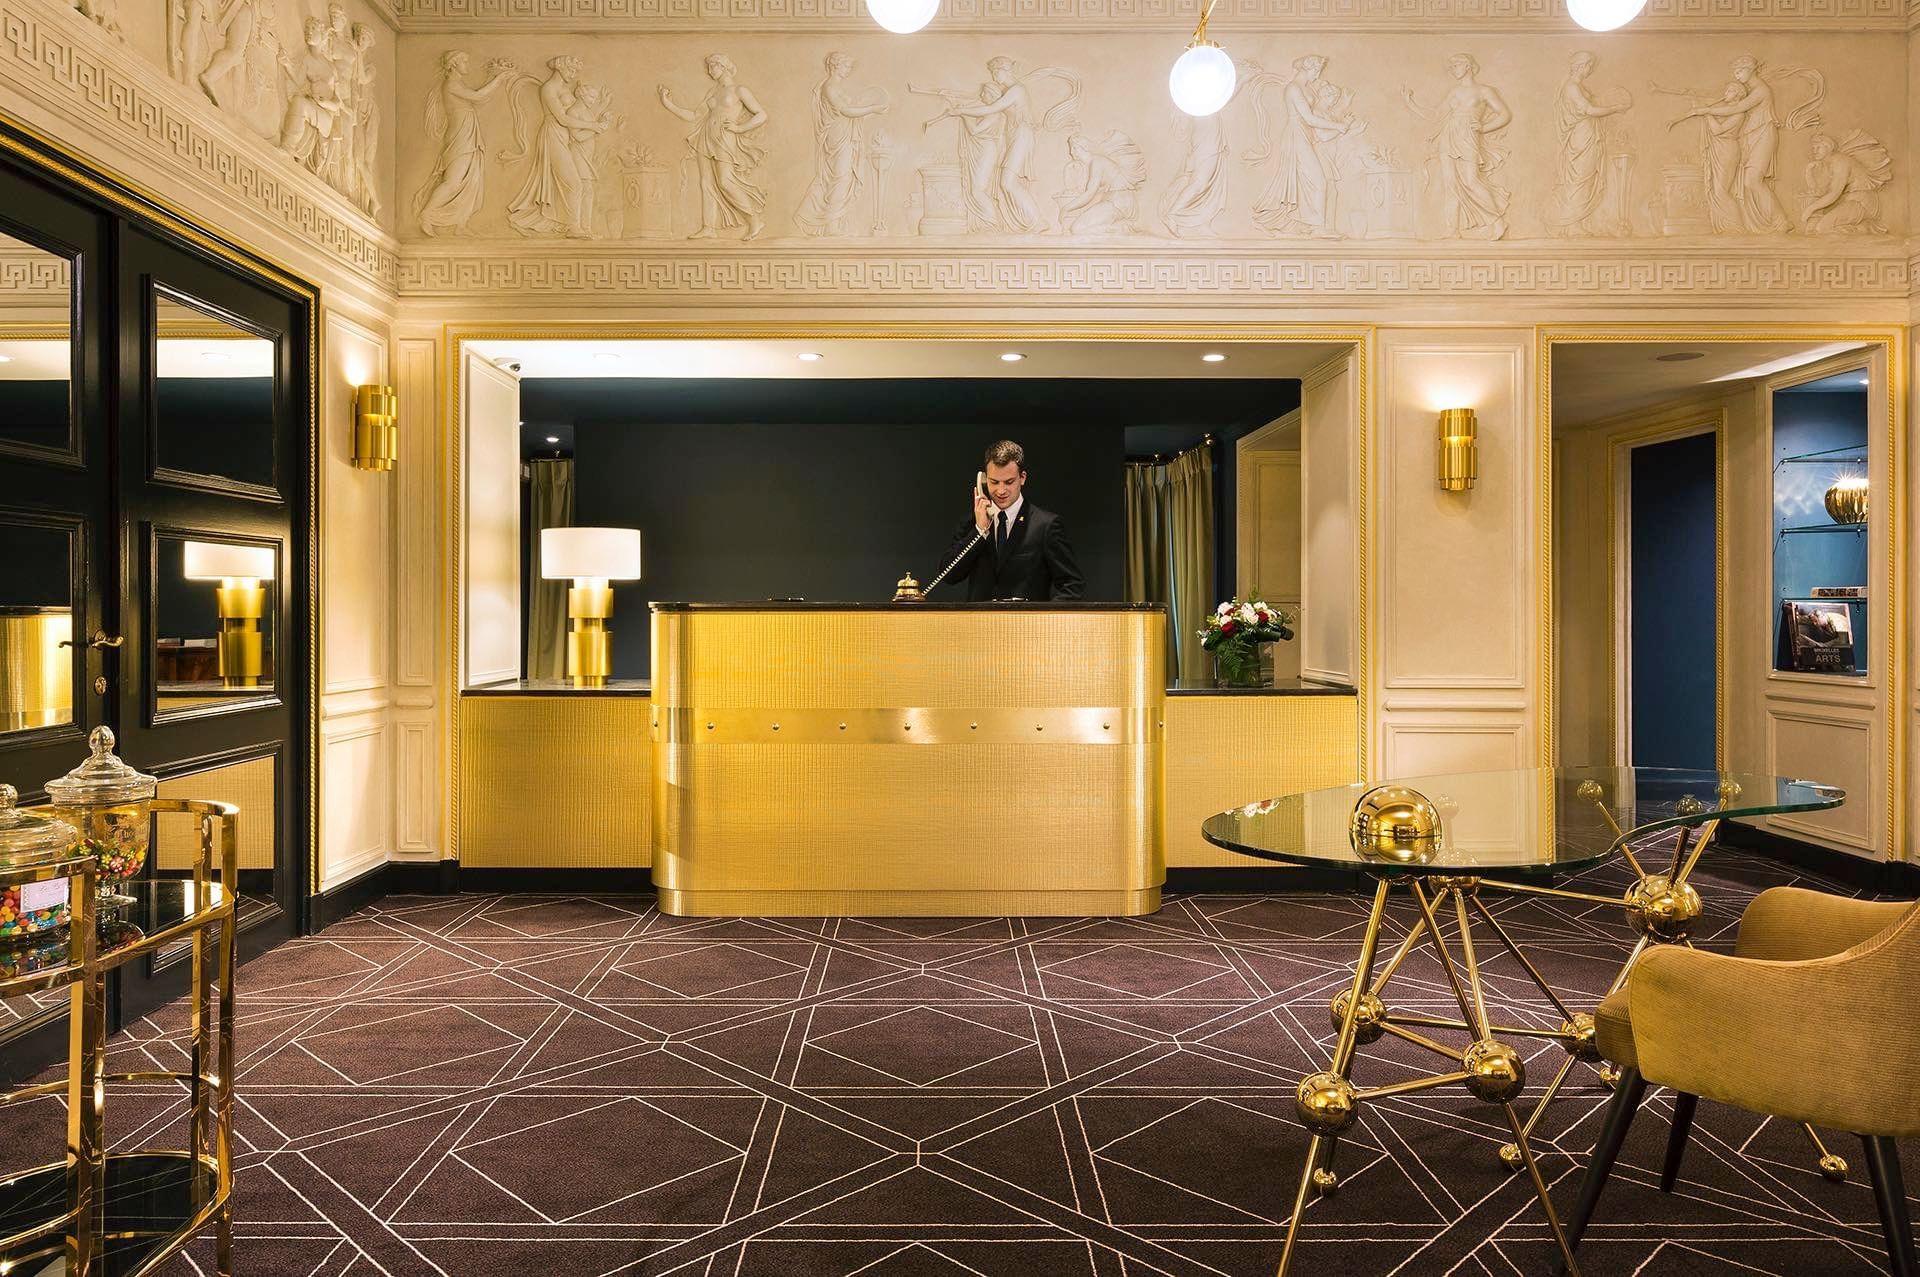 Hotel Barsey by Warwick Lobby Reception